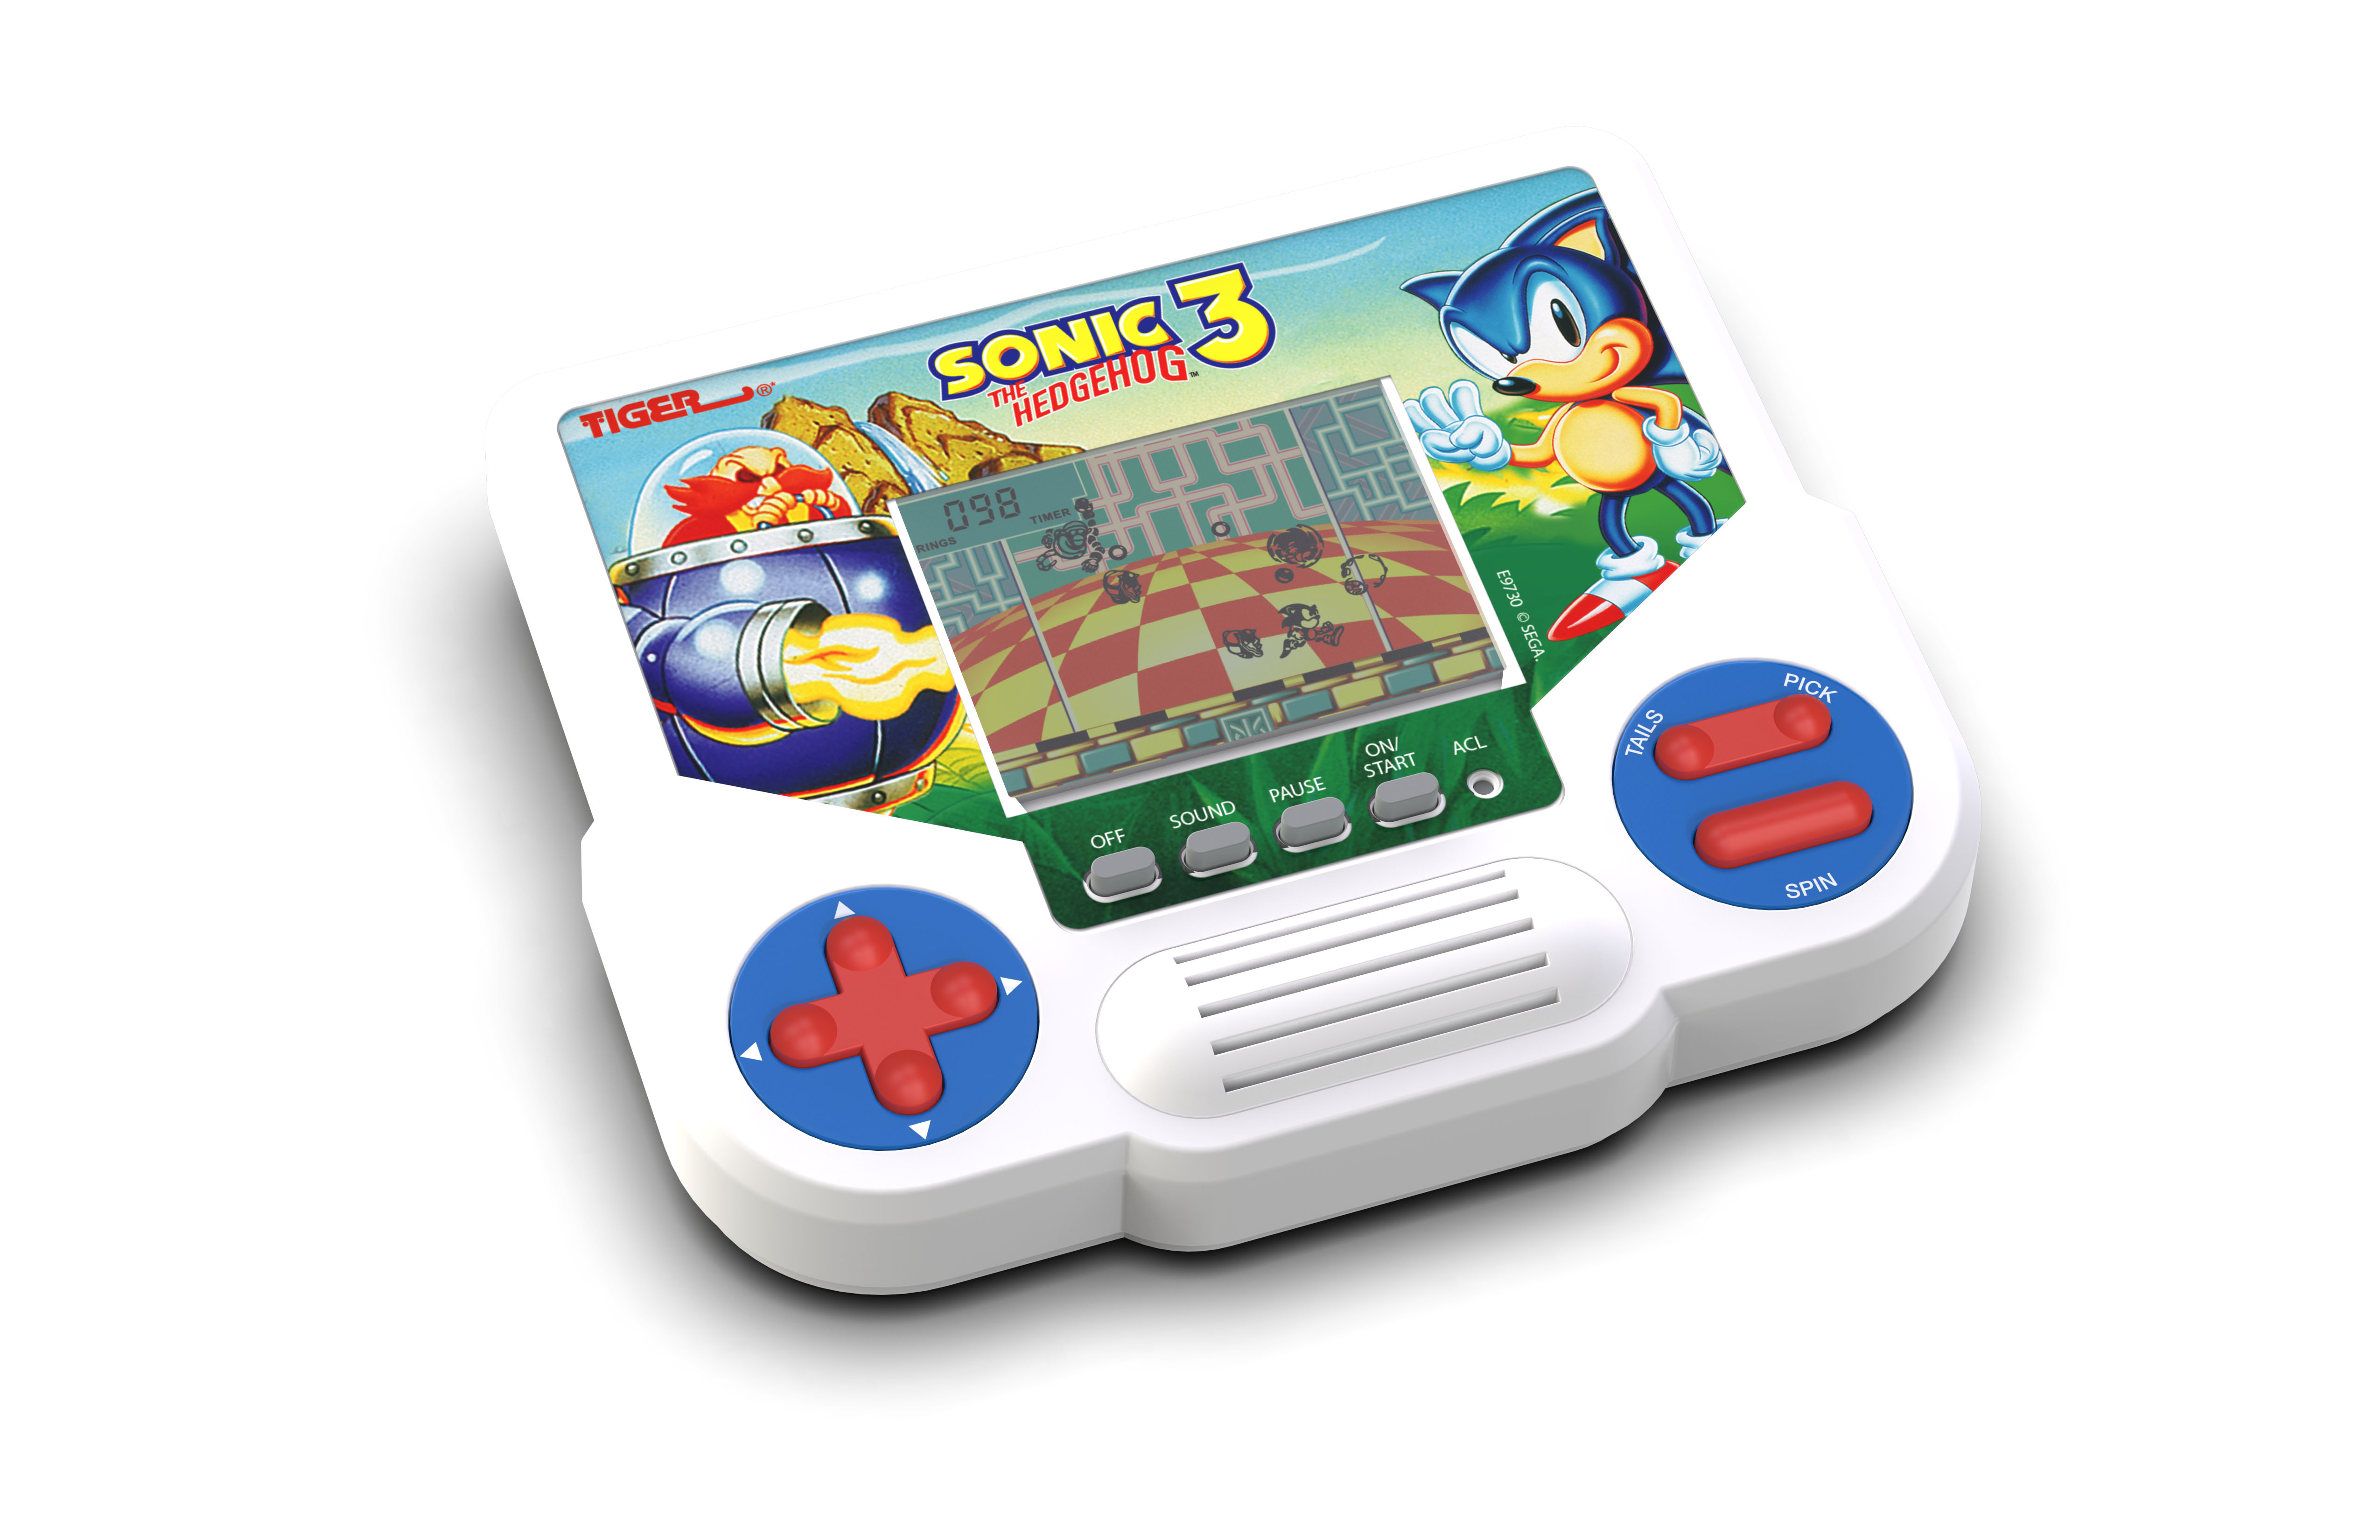 Tiger Electronics SonicFinal